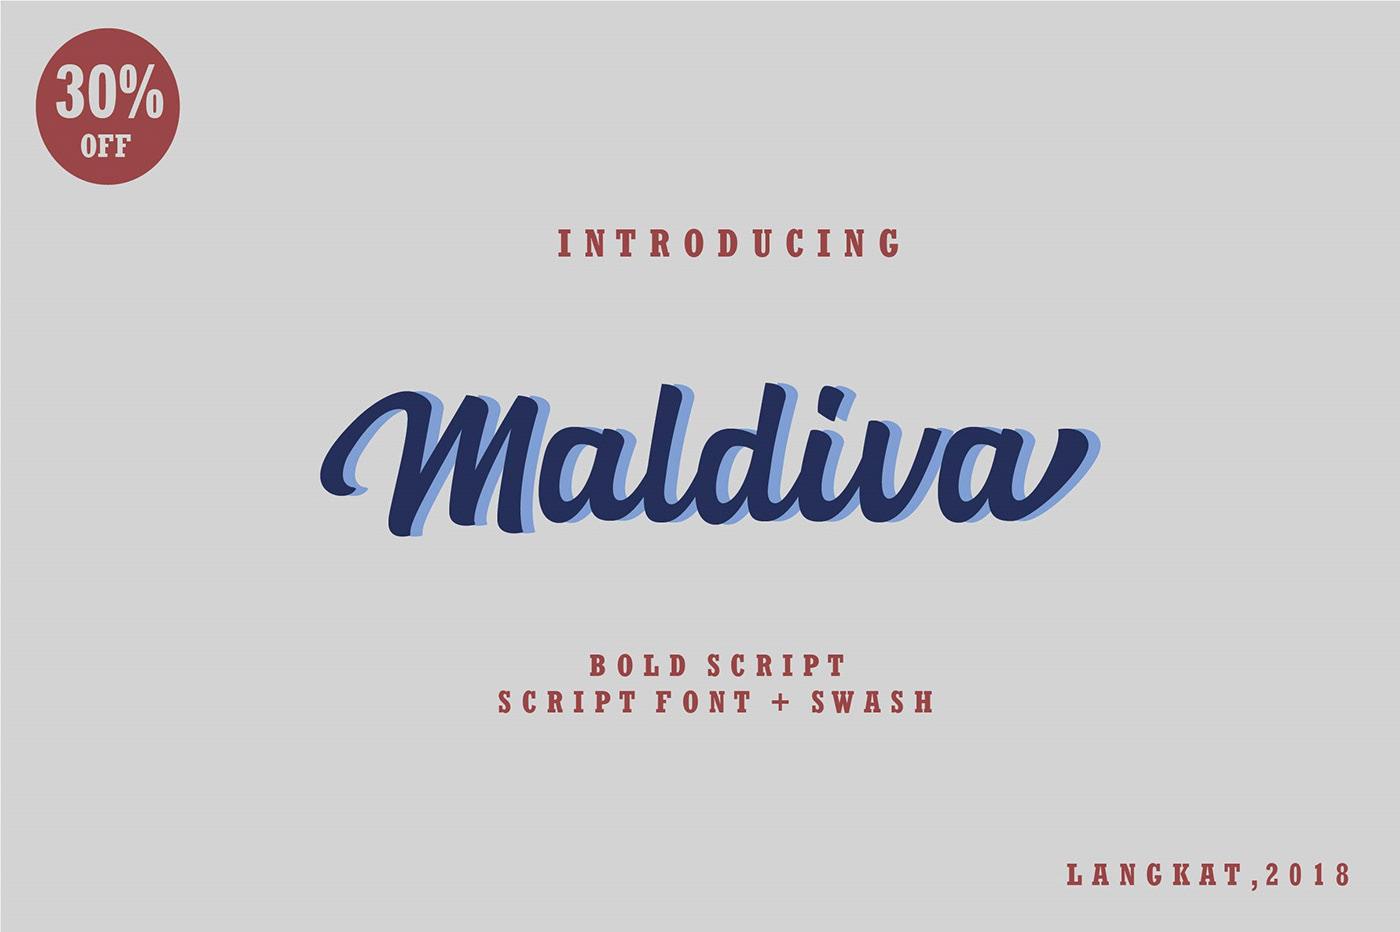 type Typeface font Script modern font Advertising  branding  logo type